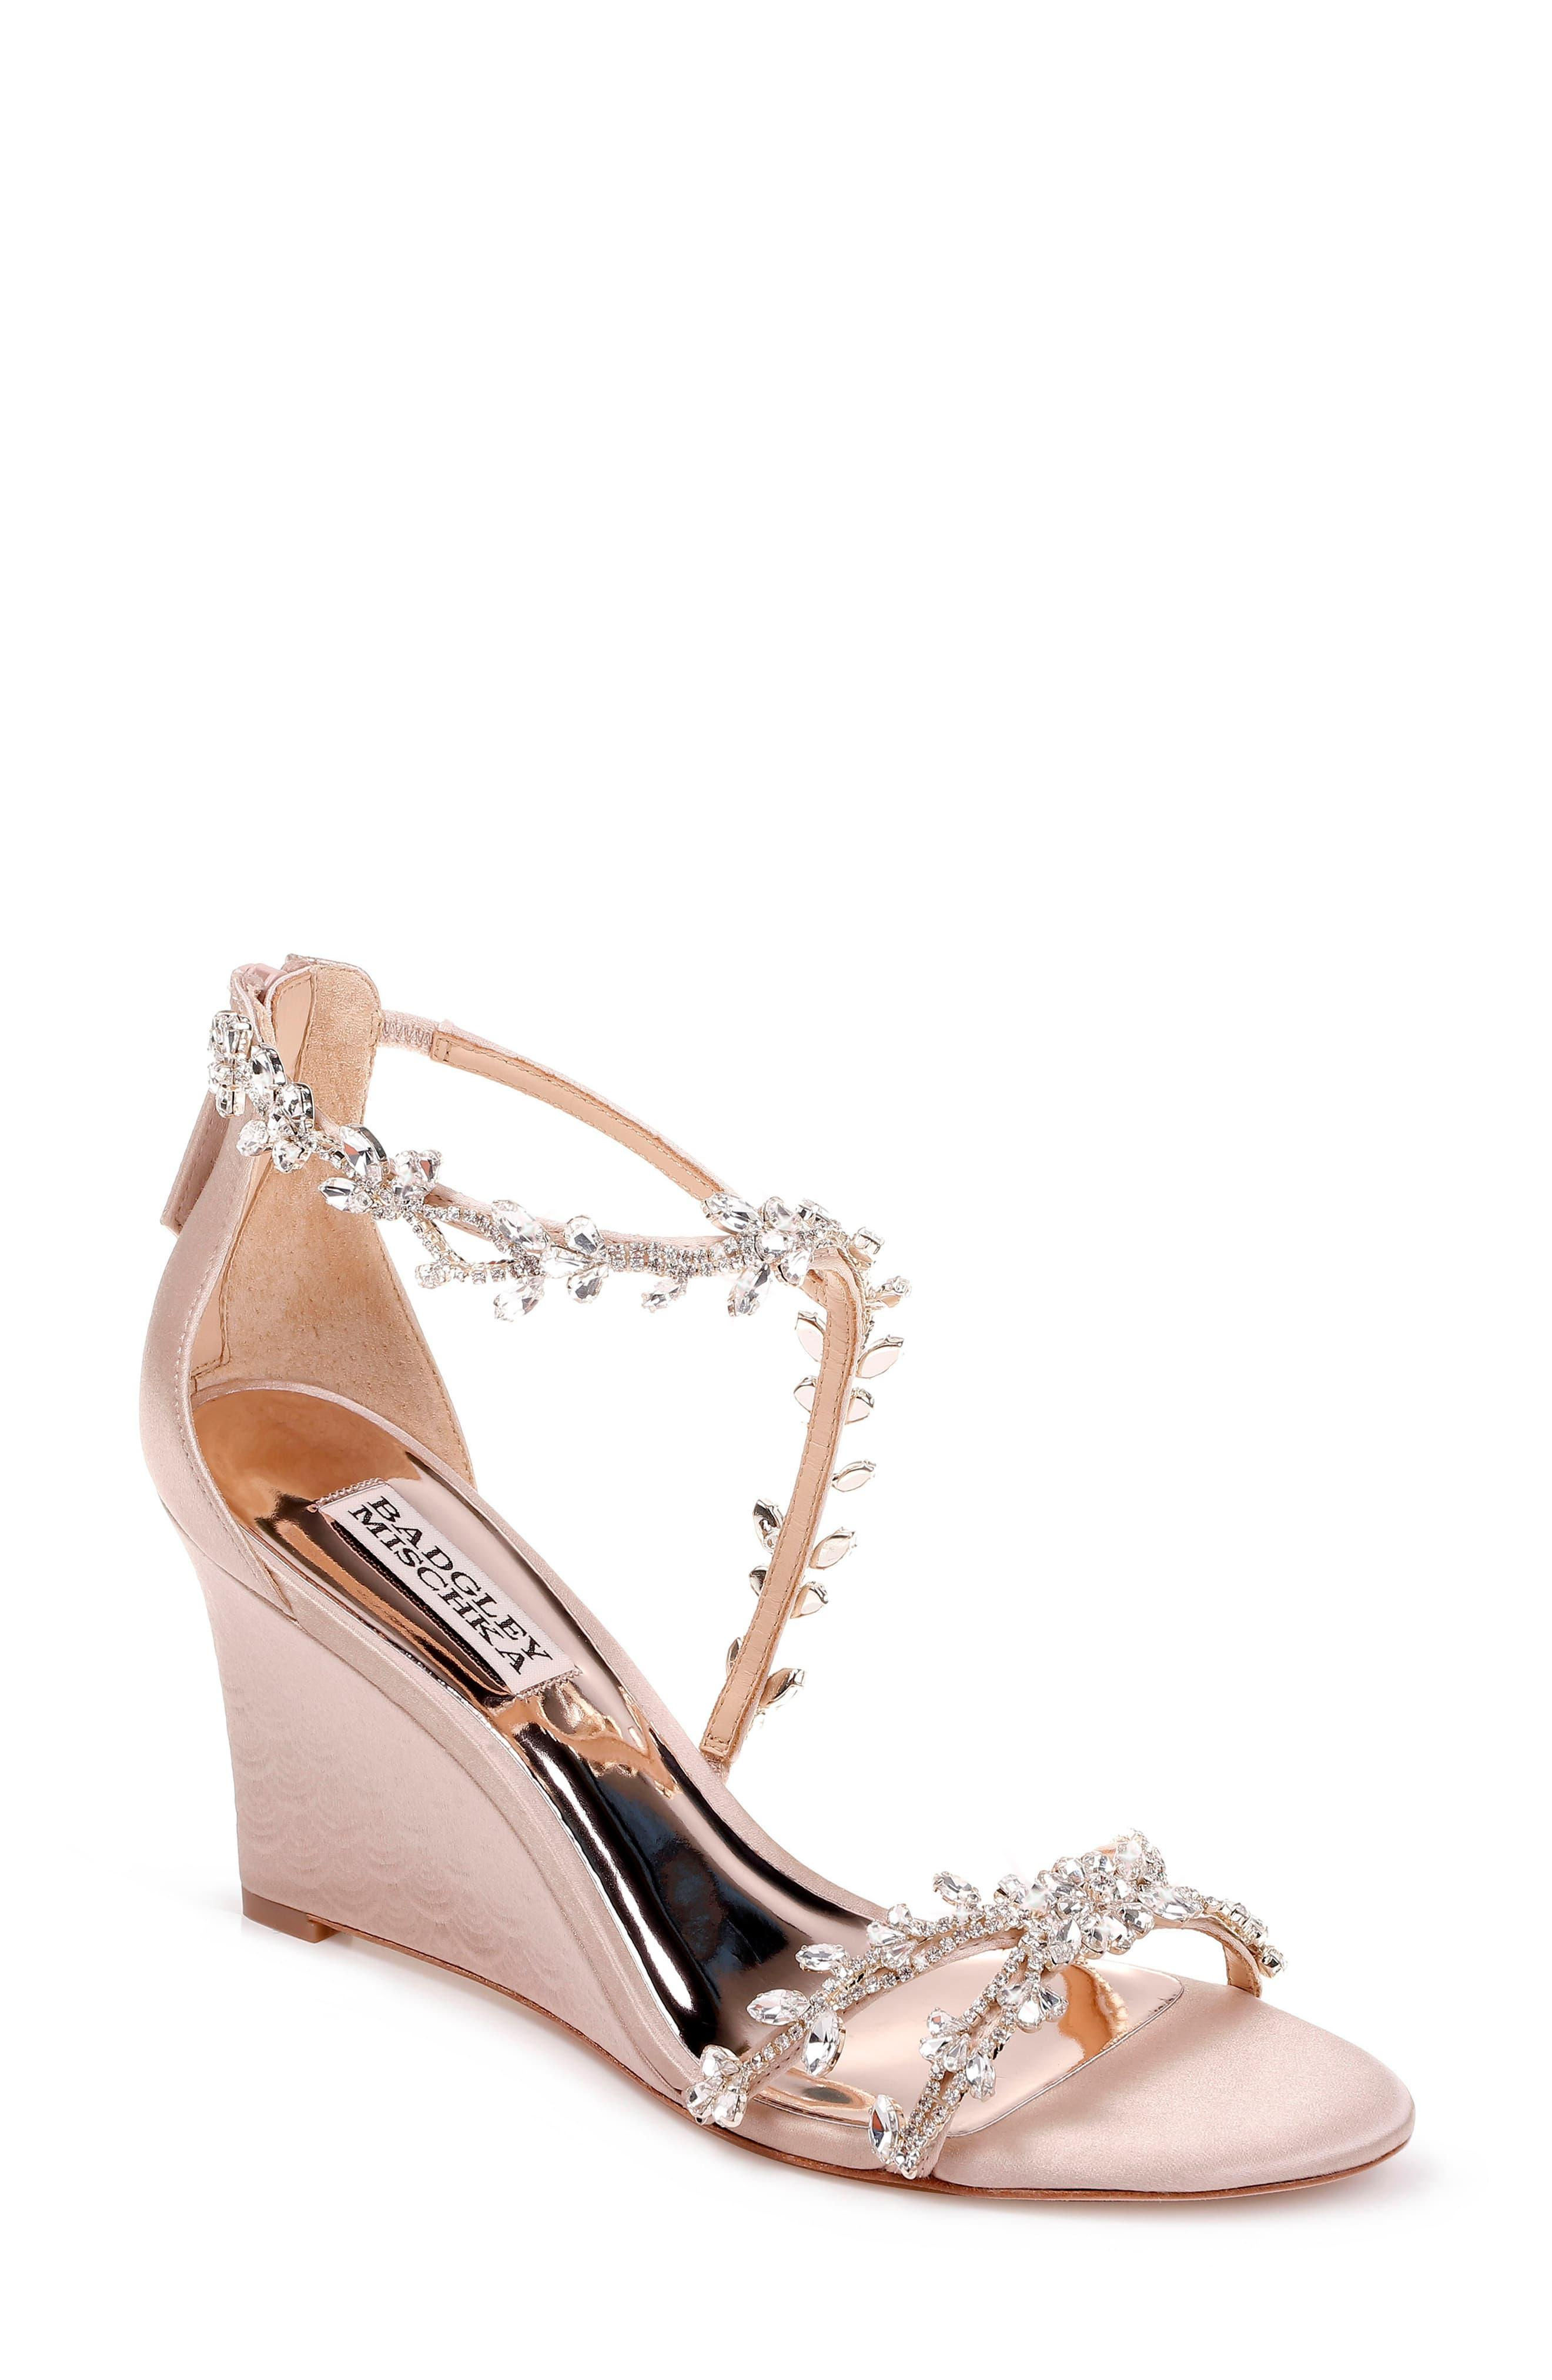 7c3d31841e Badgley Mischka. Women's Badgley Mischka Feather Crystal Embellished Wedge  Sandal